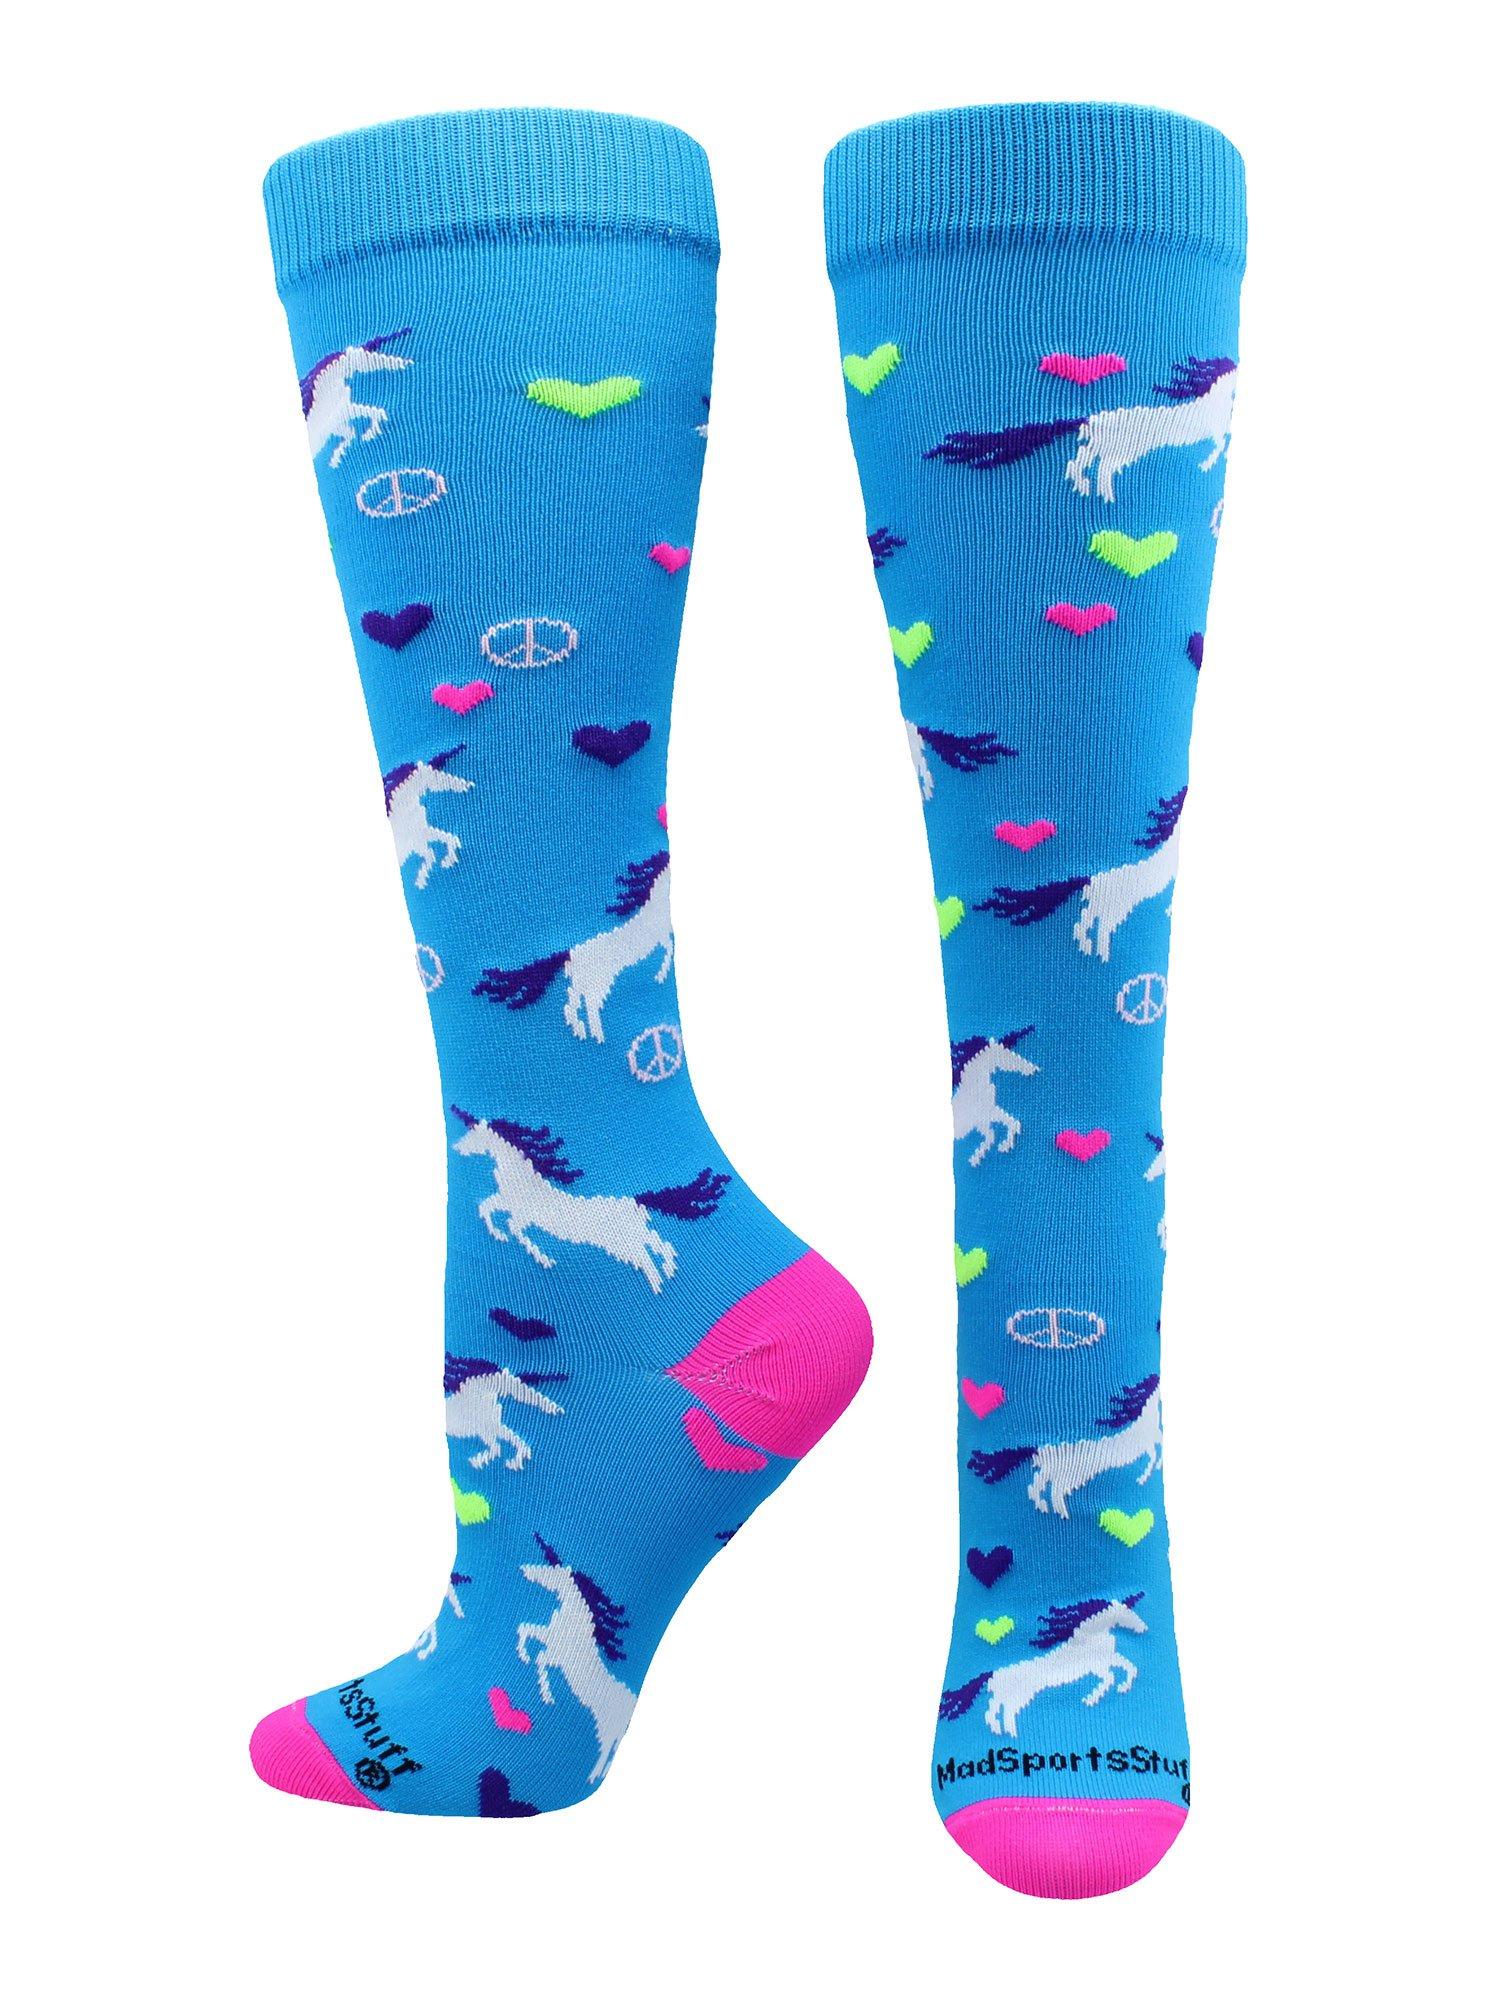 MadSportsStuff Peace Love Unicorn Over the Calf Socks (Electric Blue/Neon Pink, Medium)